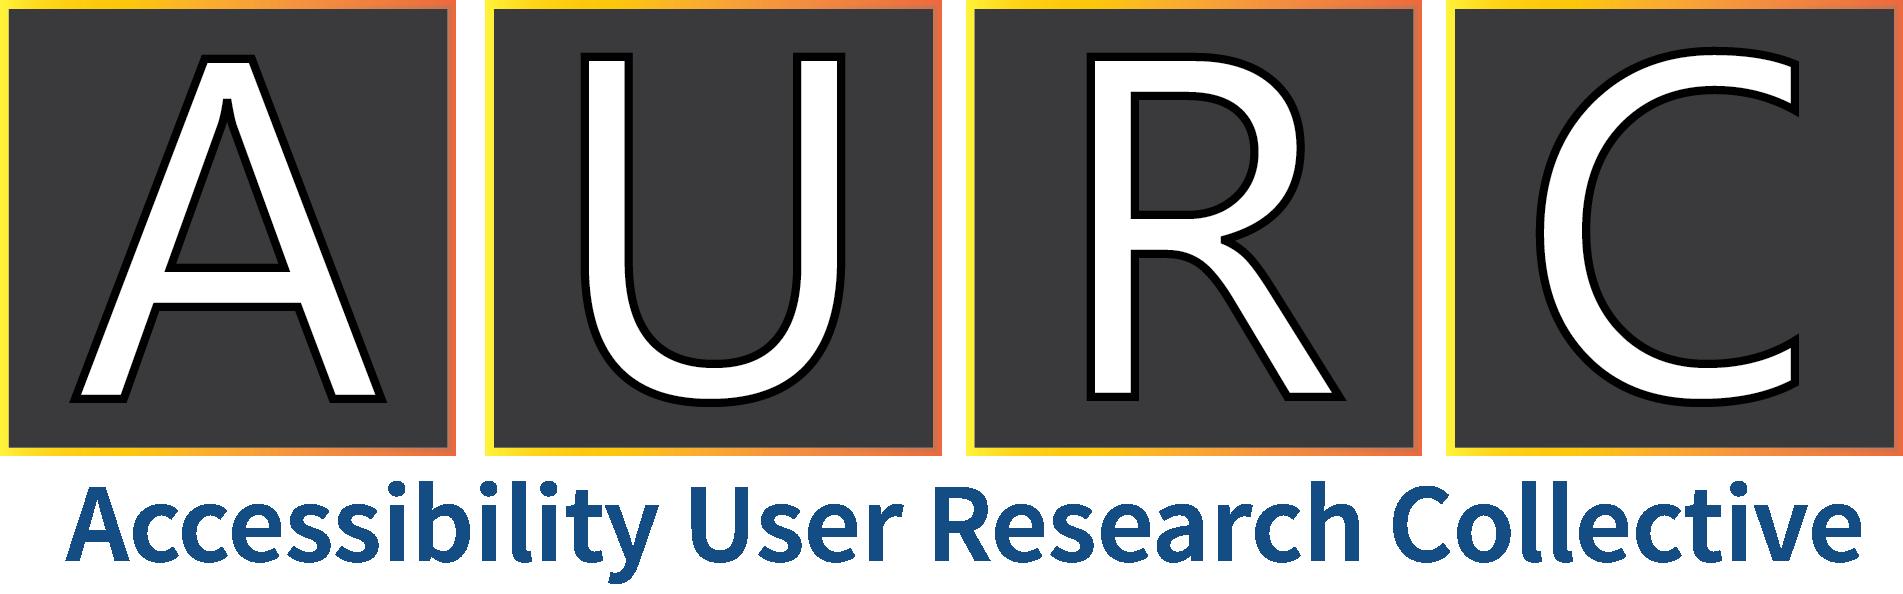 AURC logo